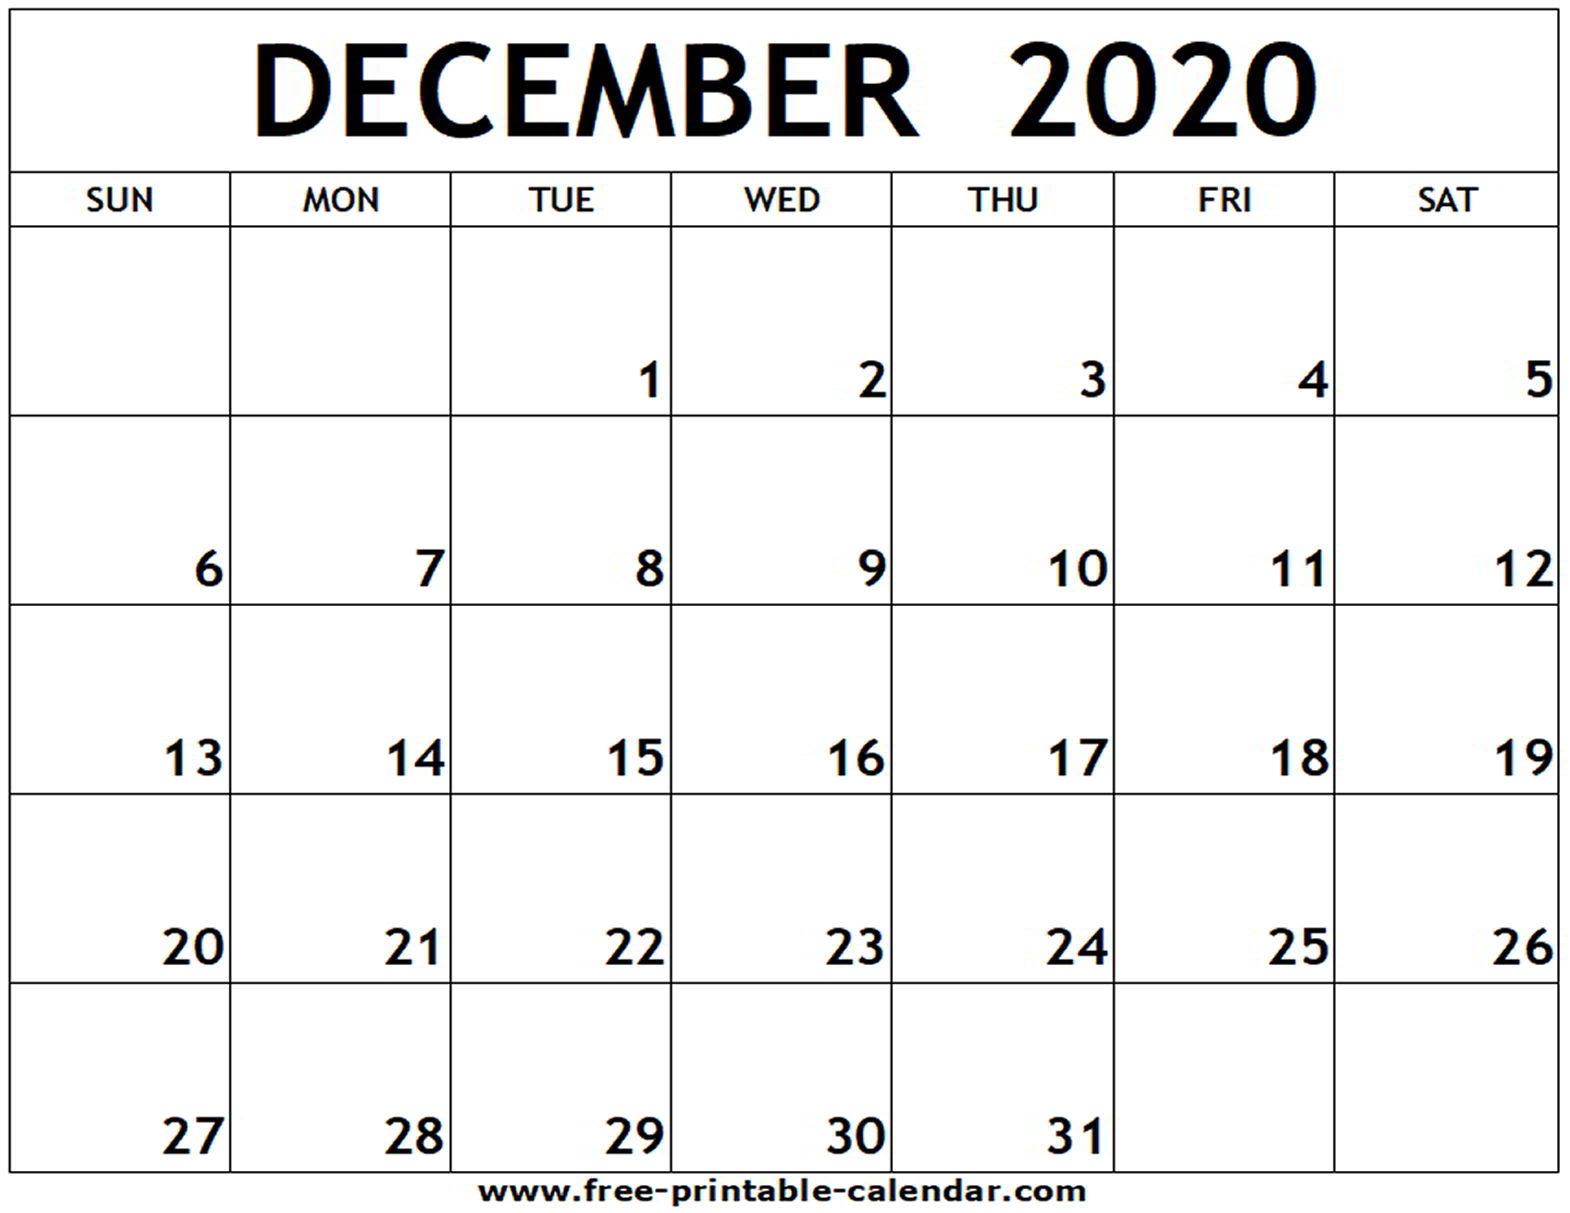 December 2020 Blank Calendar - Togo.wpart.co